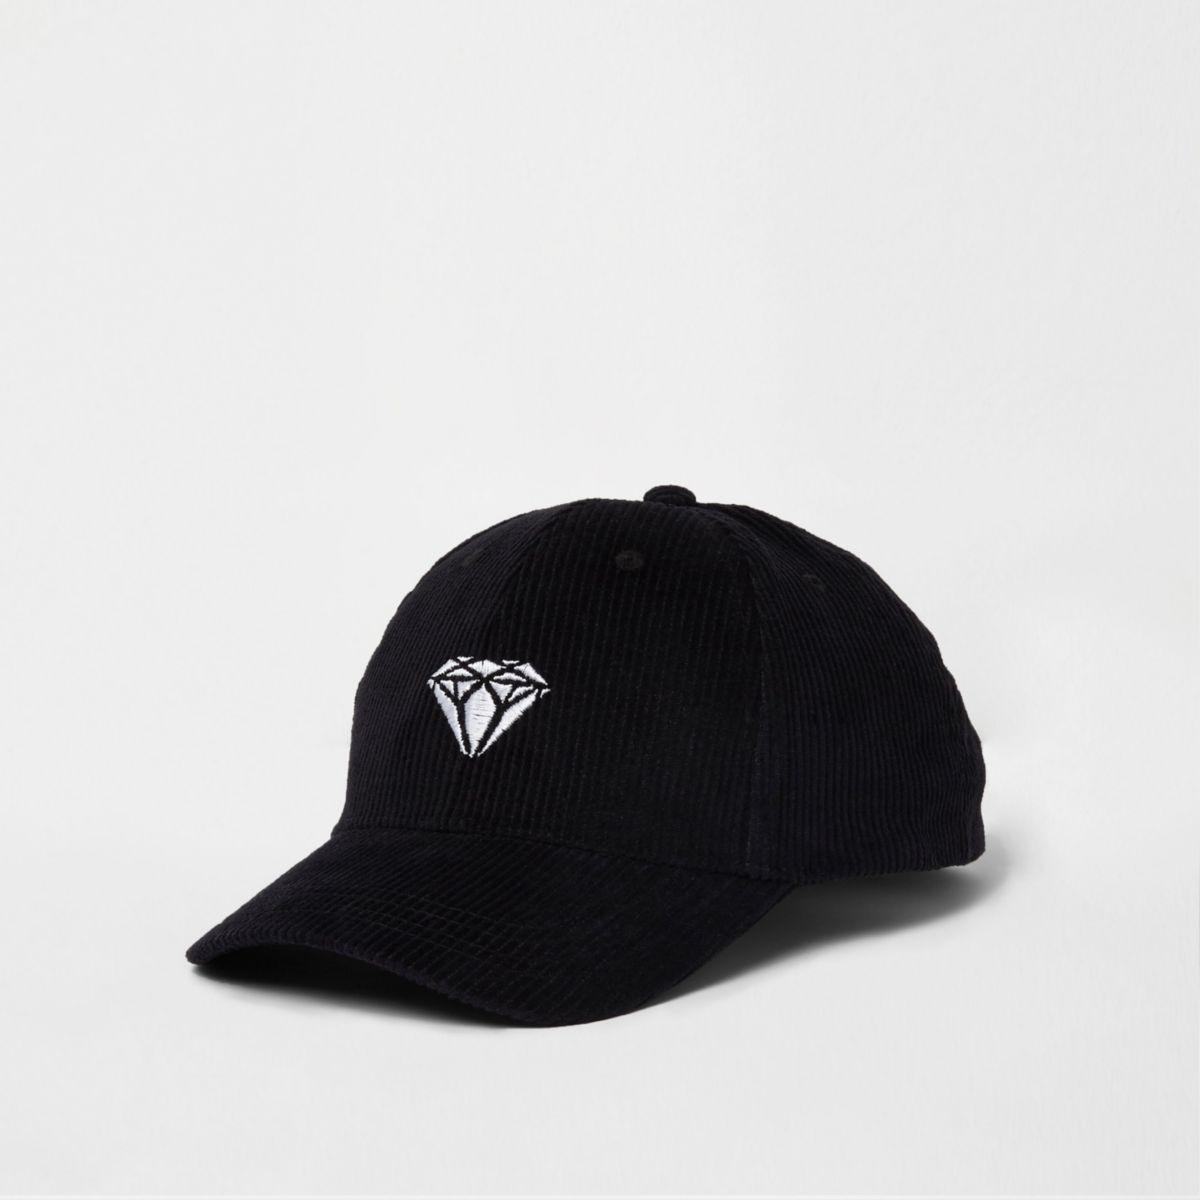 Black cord diamond embroidered baseball cap